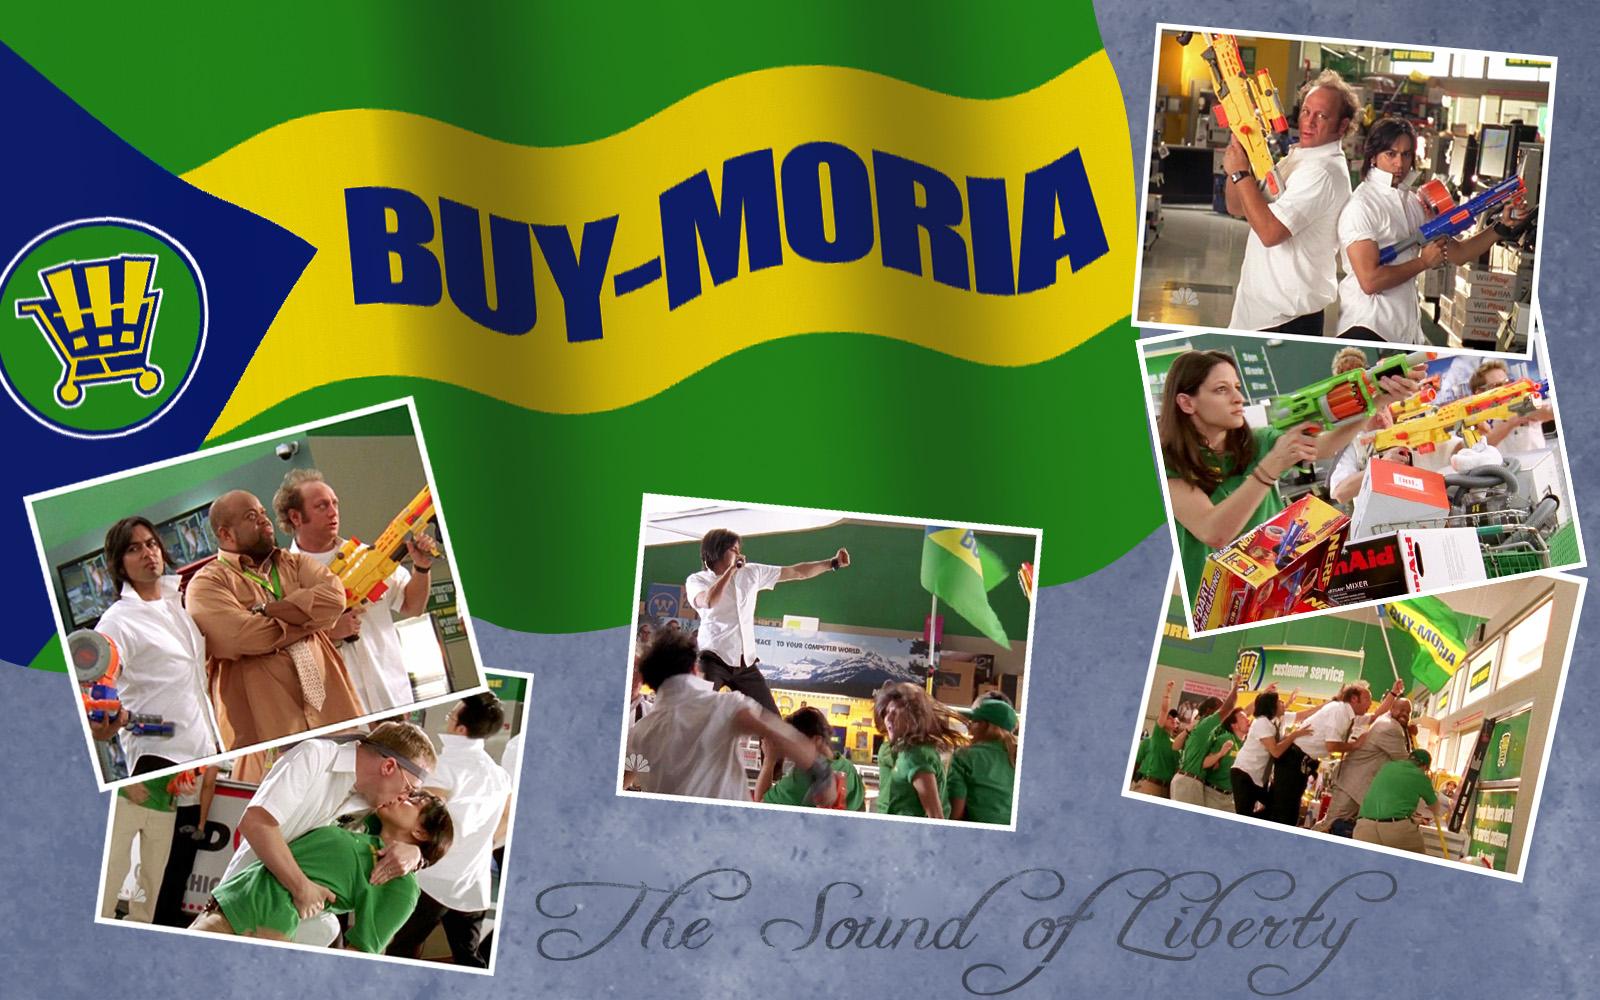 Buy-Moria:The Sound of Liberty